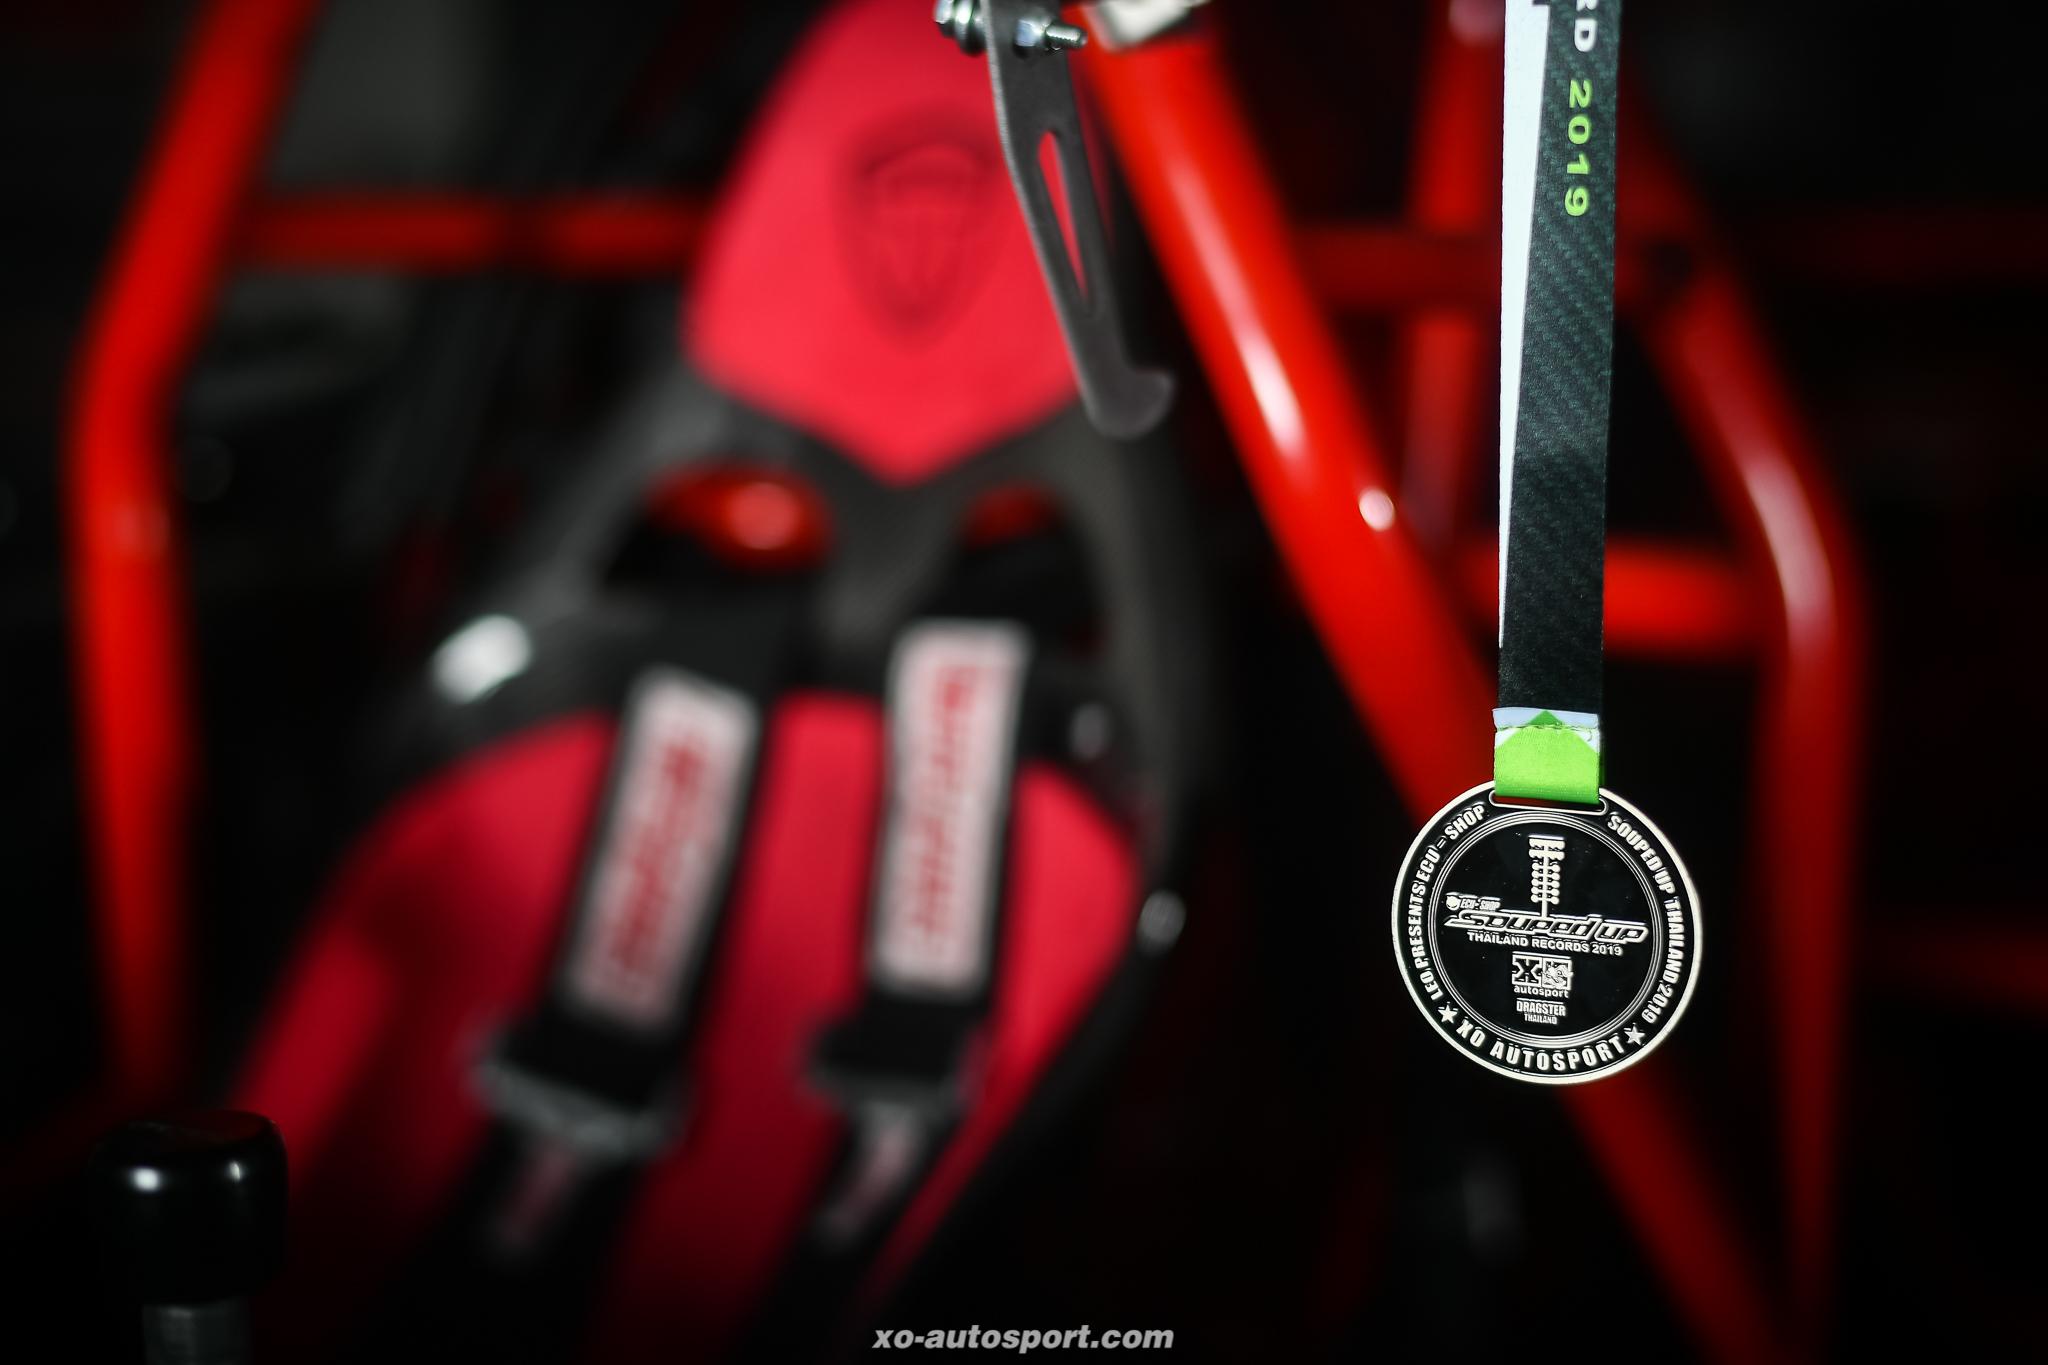 INTEGRA DC2 PRO 4 FWD Champion by FLOW LAB CNC 22